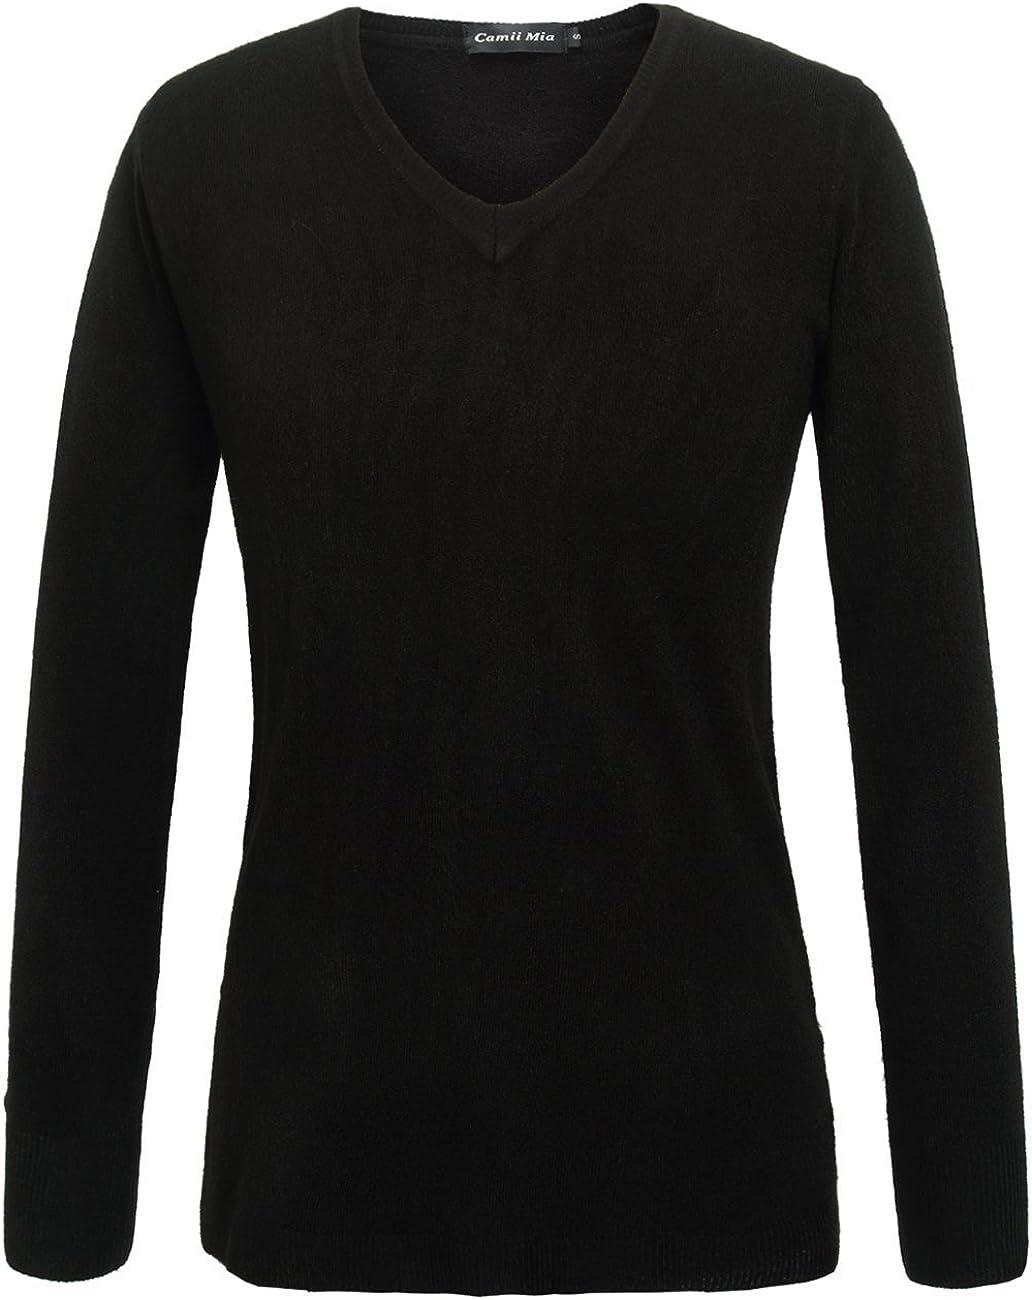 Cheap Camii Mia Women's V Neck Sweater Pullover SALENEW very popular! Long Sleeve